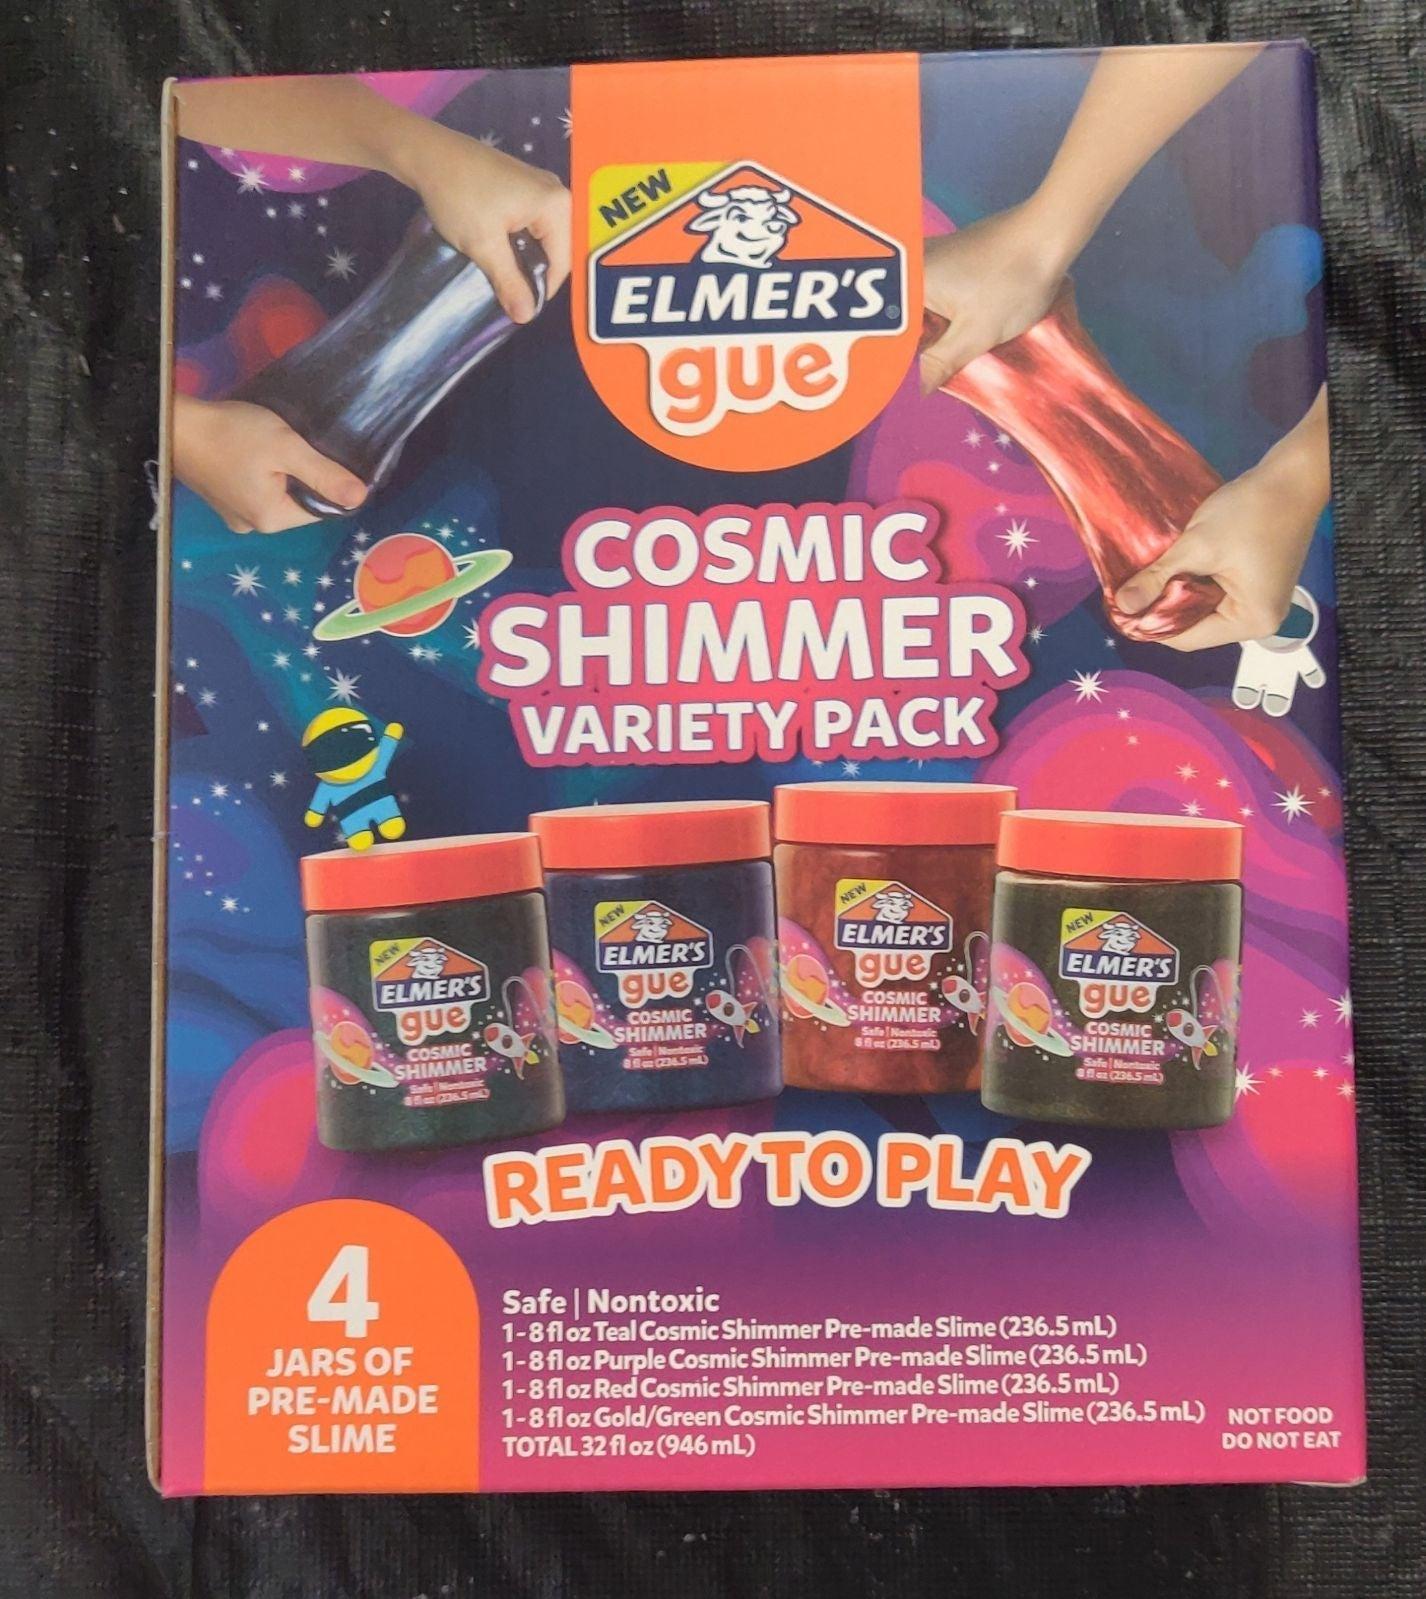 Elmer's gue Cosmic Shimmer Variety pack